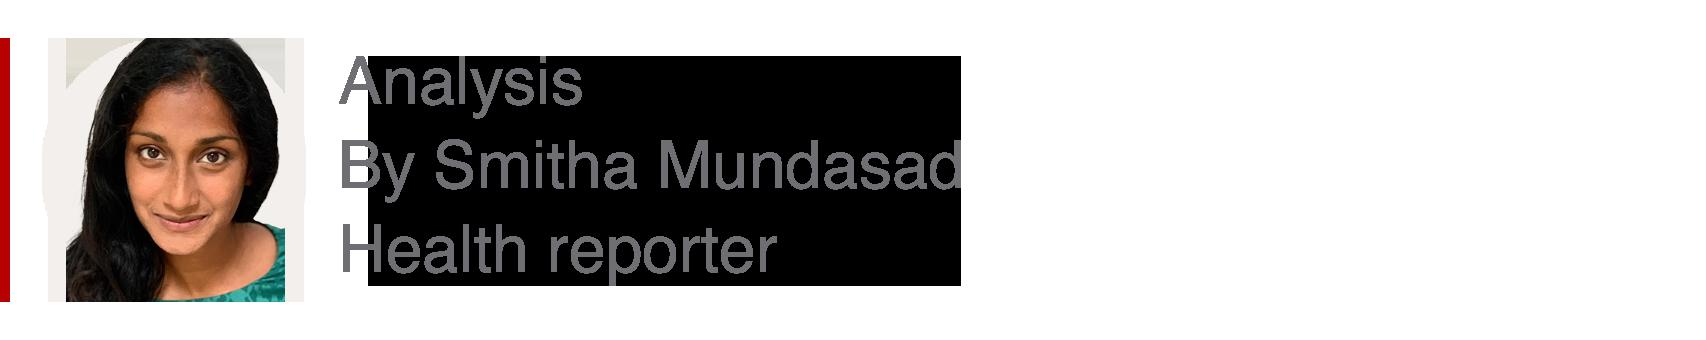 Analysis box by Smitha Mundasad